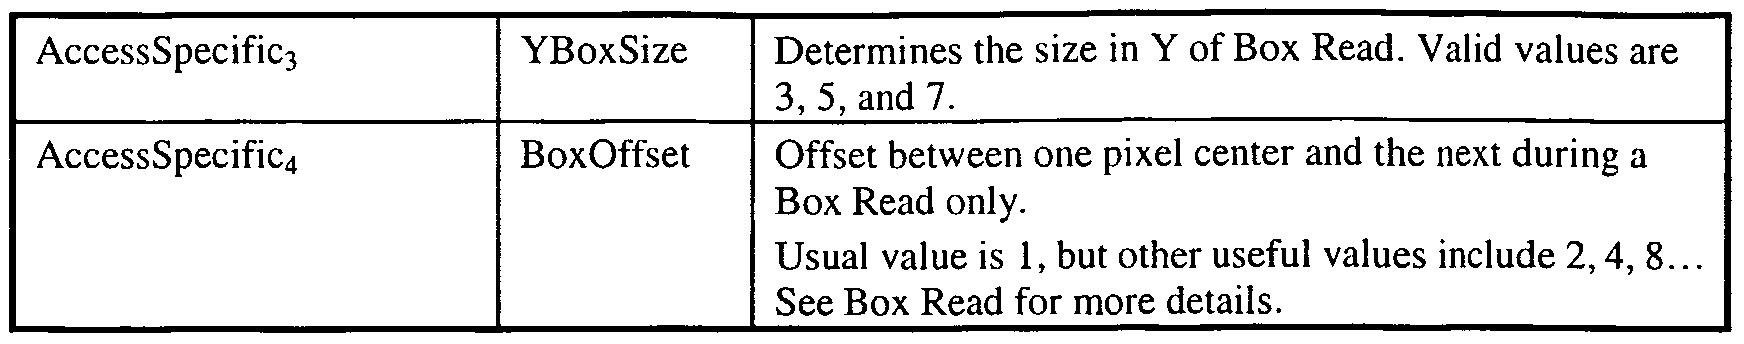 lb photo realism 128x 1-3 2-4 betting system